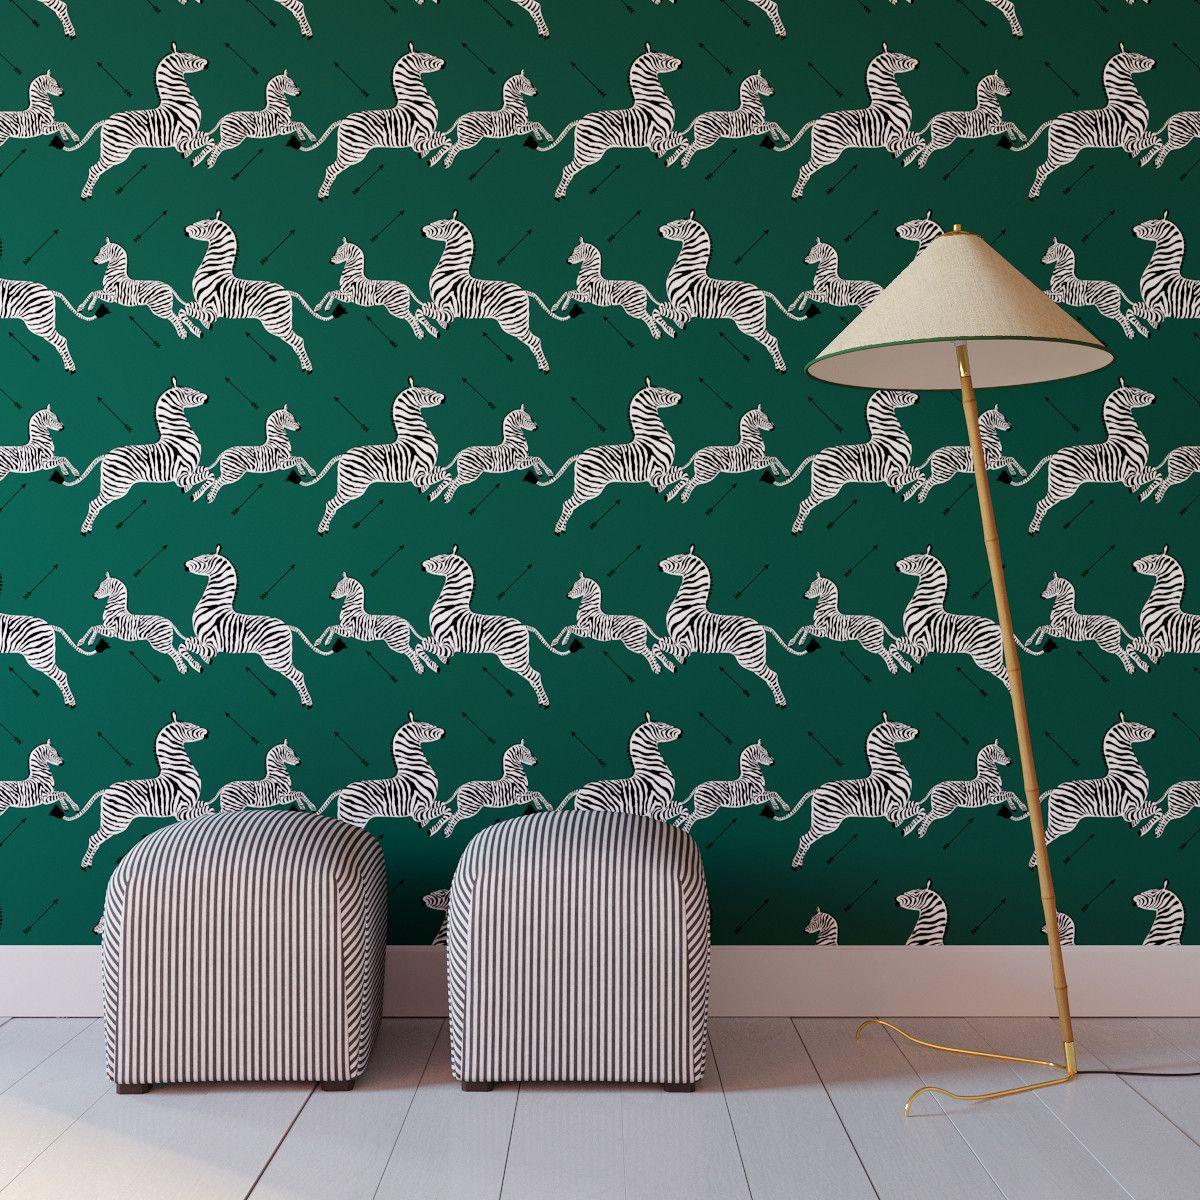 Emerald Zebra Upholstered Custom Peel And Stick Wallpaper Roll Wallpaper Roll Peel And Stick Wallpaper Green Home Decor